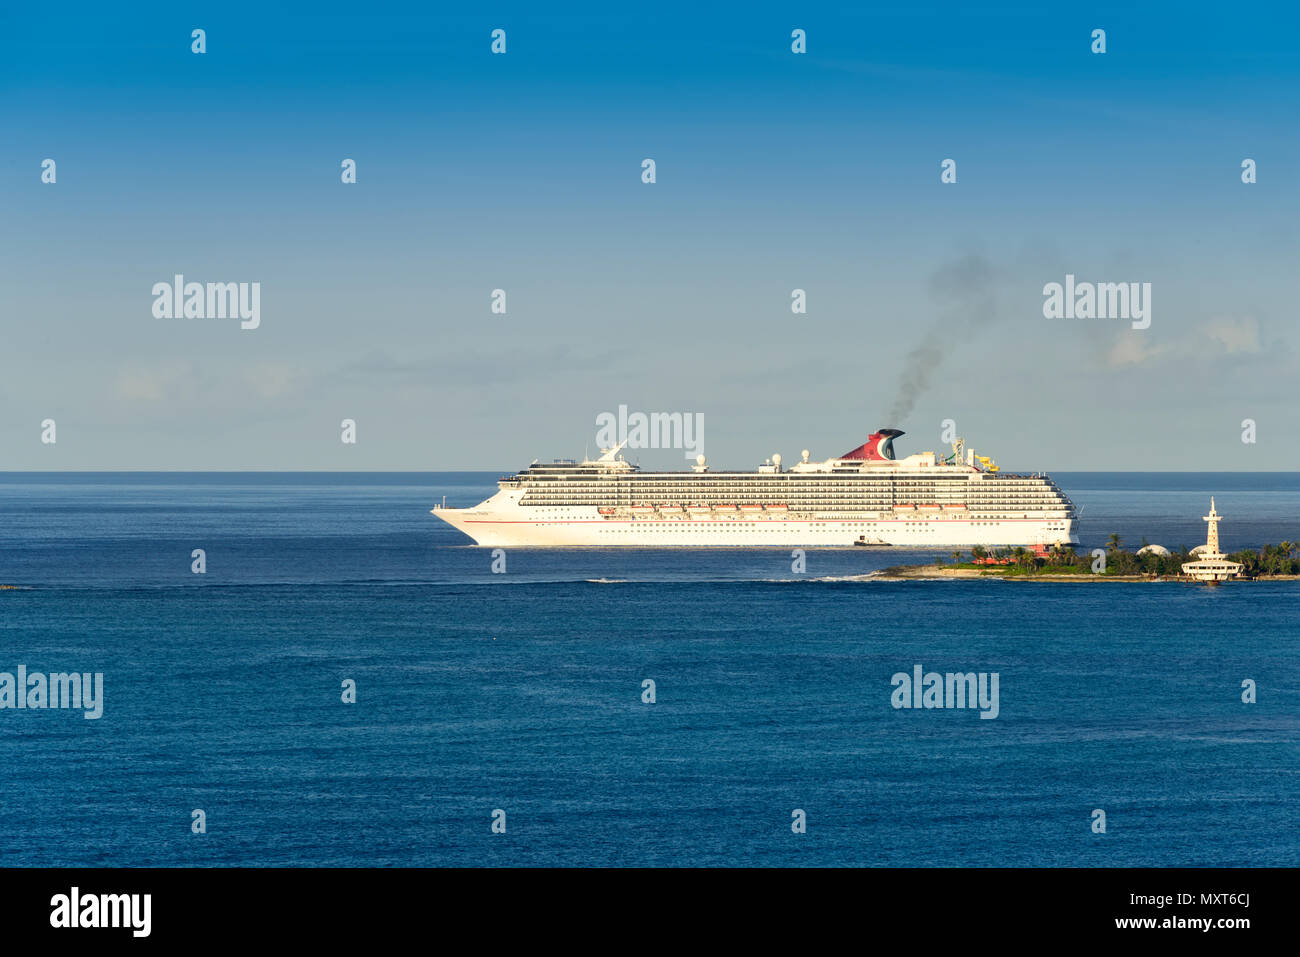 Carnival Cruise Lines Caribbean Stock Photos & Carnival